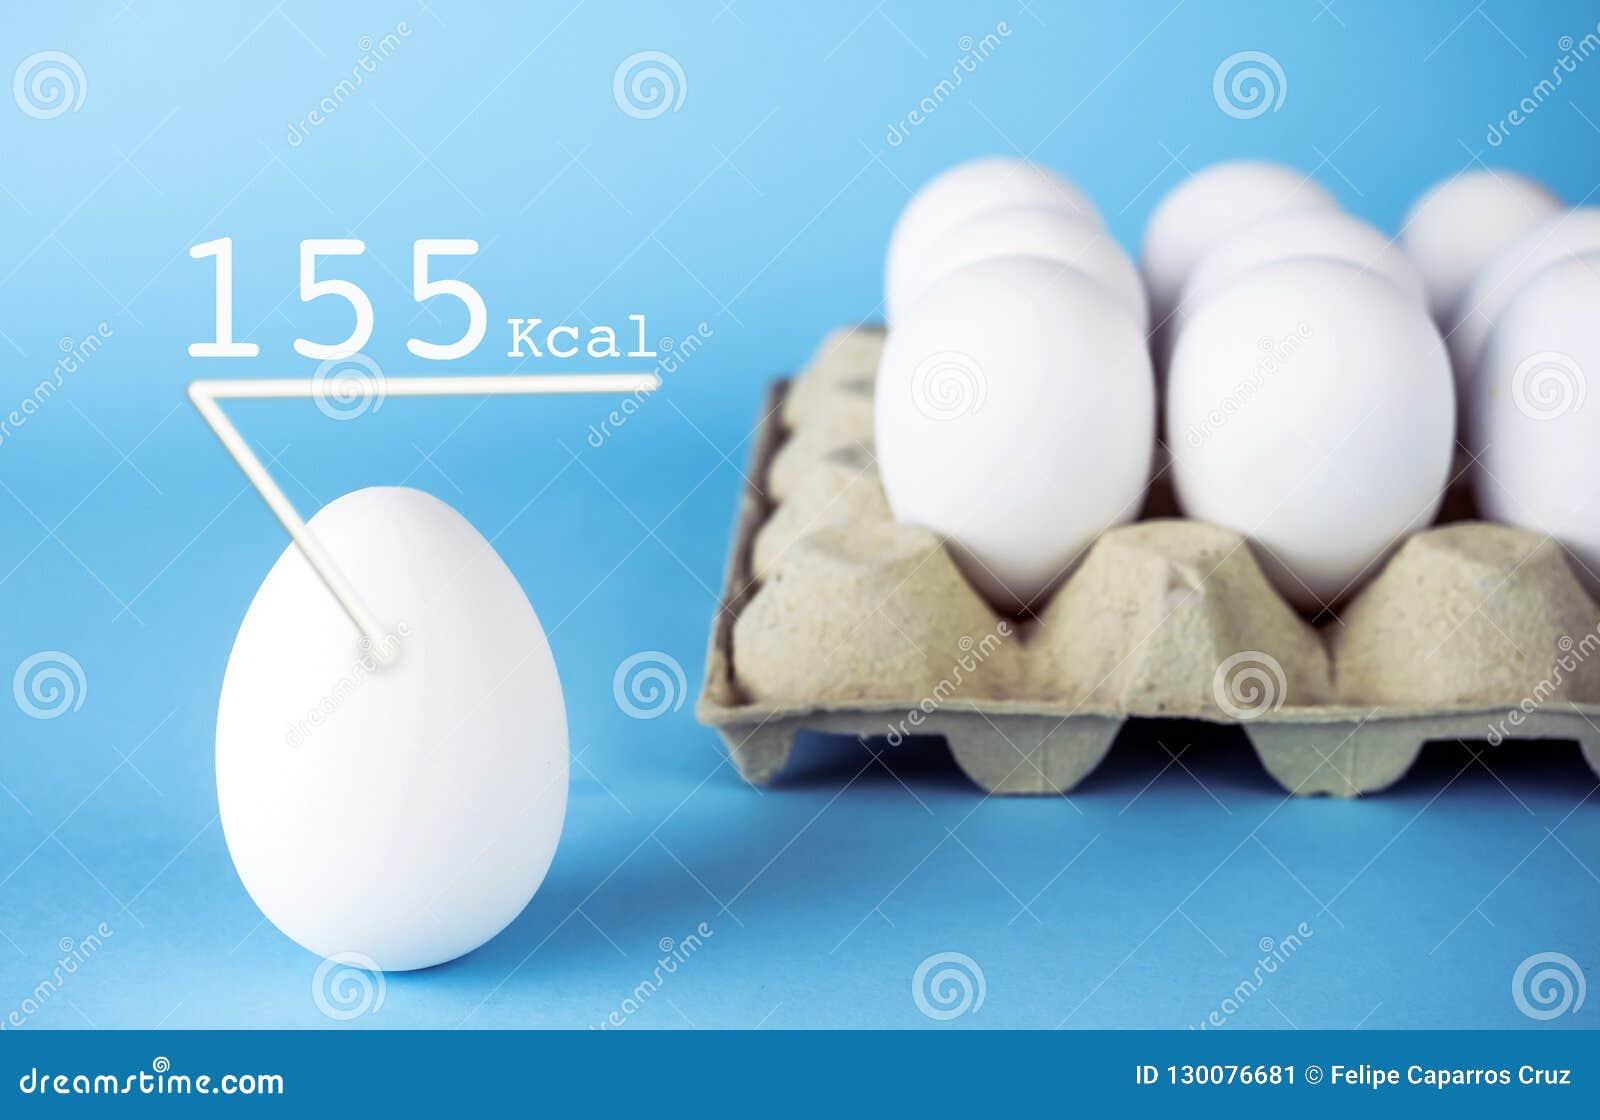 White Hen Eggs 155 K Calories Has An Egg